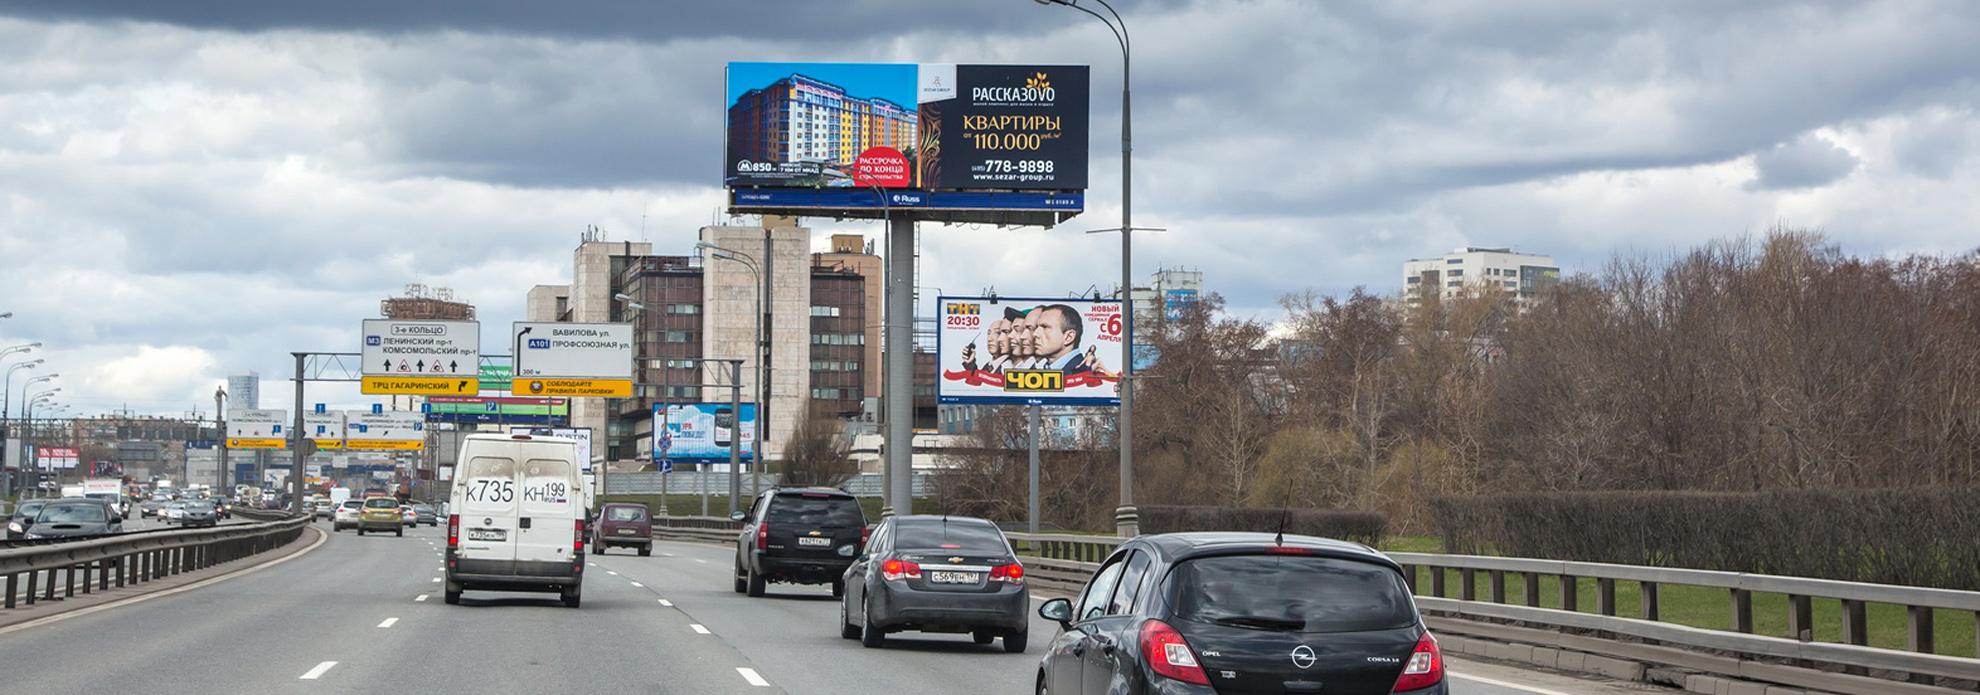 supersite-reklama-moscow